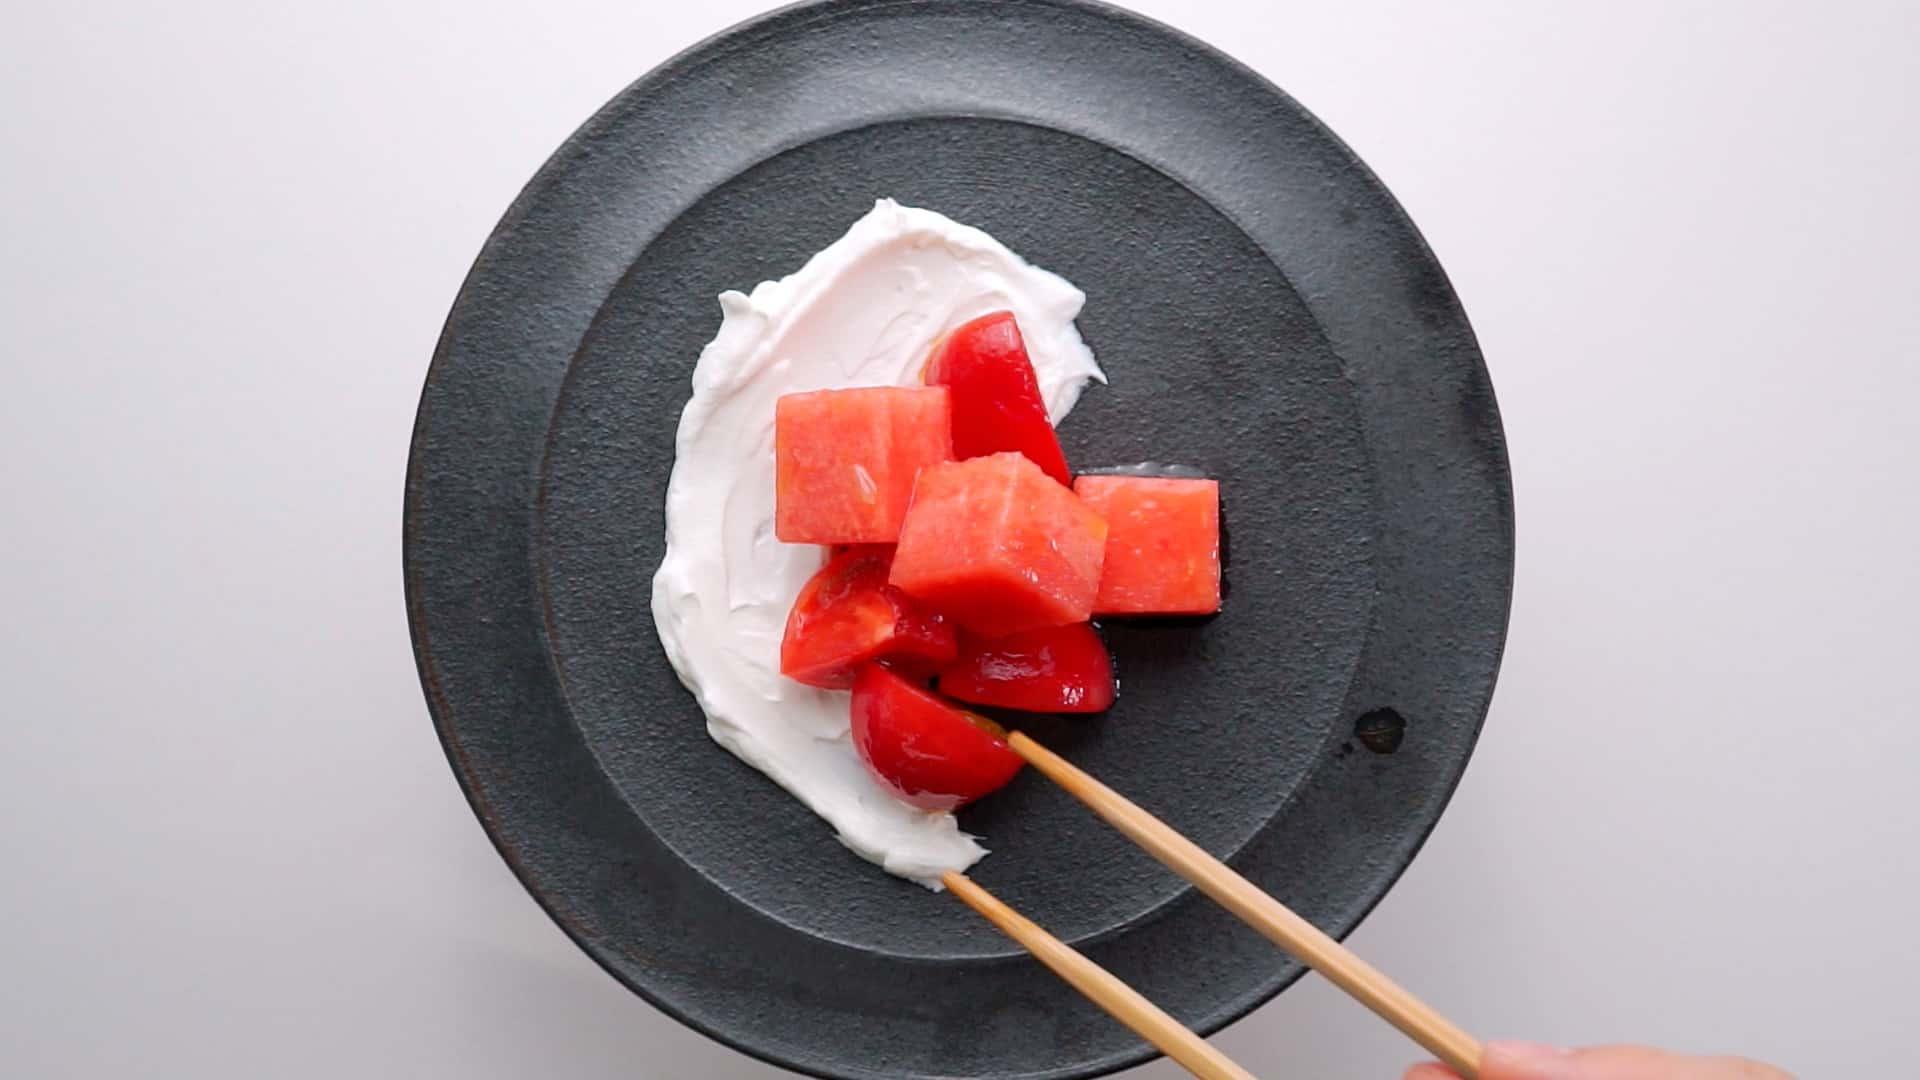 Plating watermelon and tomato salad.